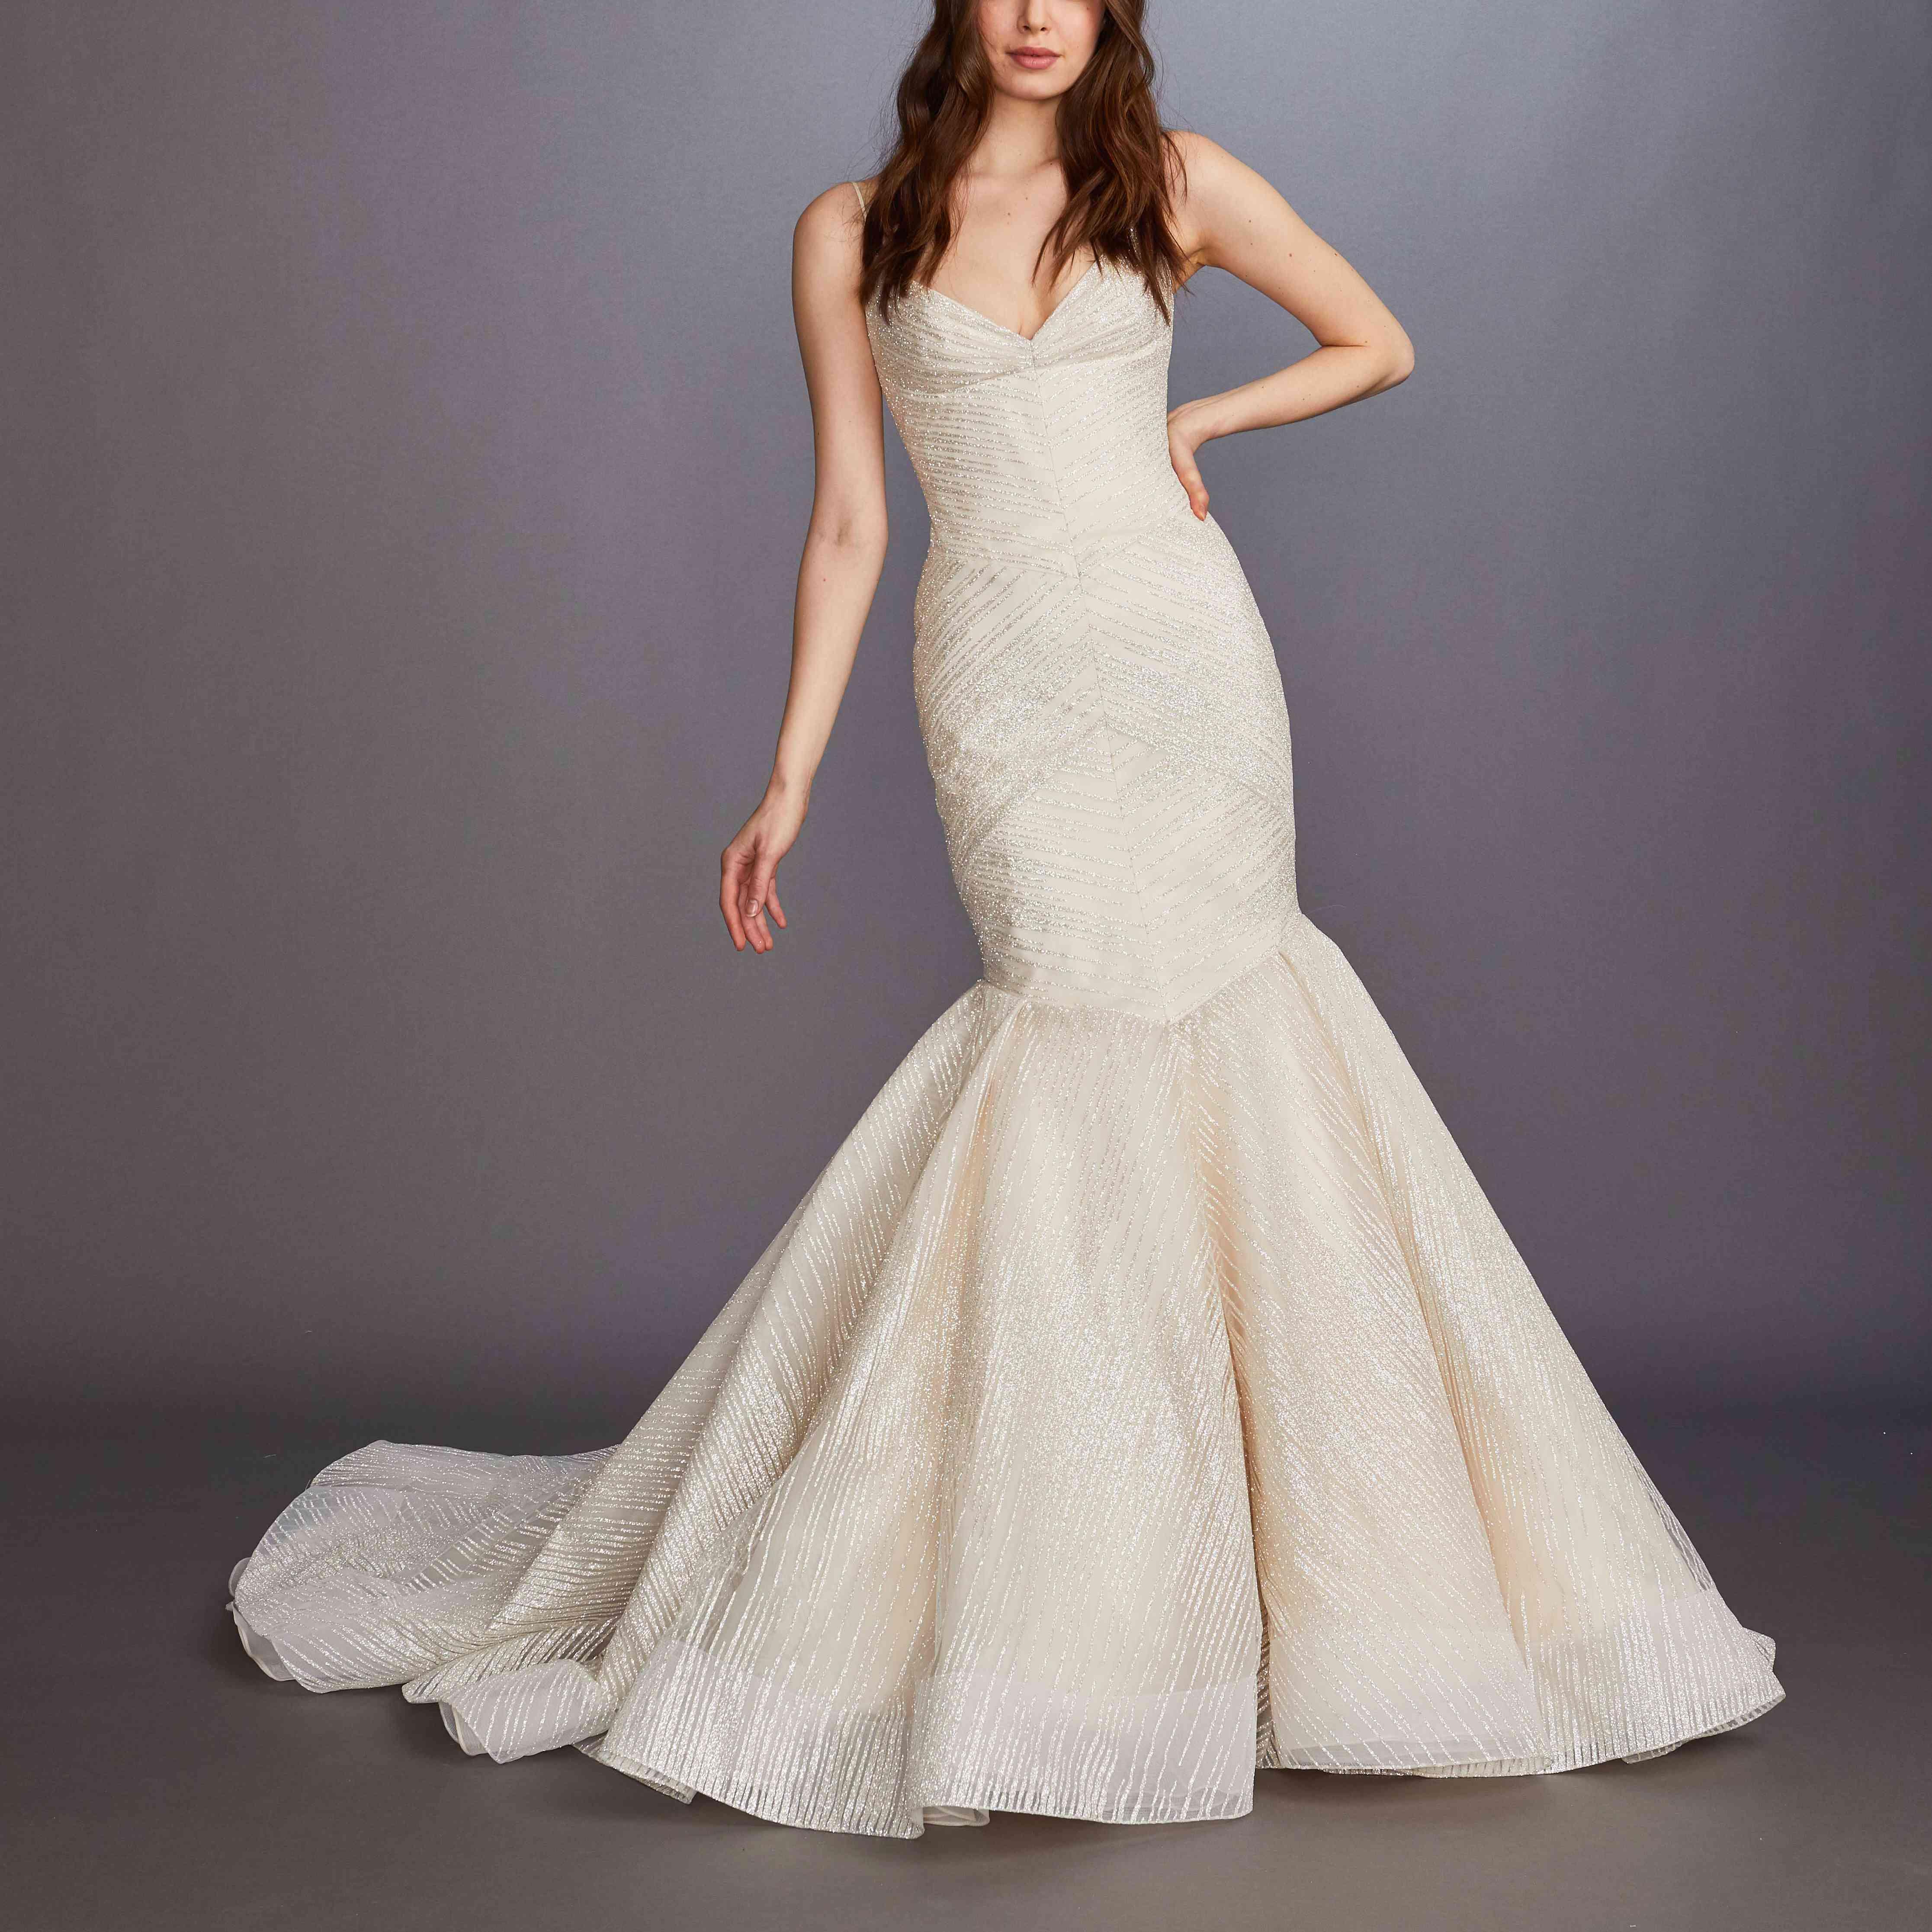 Marilla blush fit-and-flare wedding dress by Lazaro